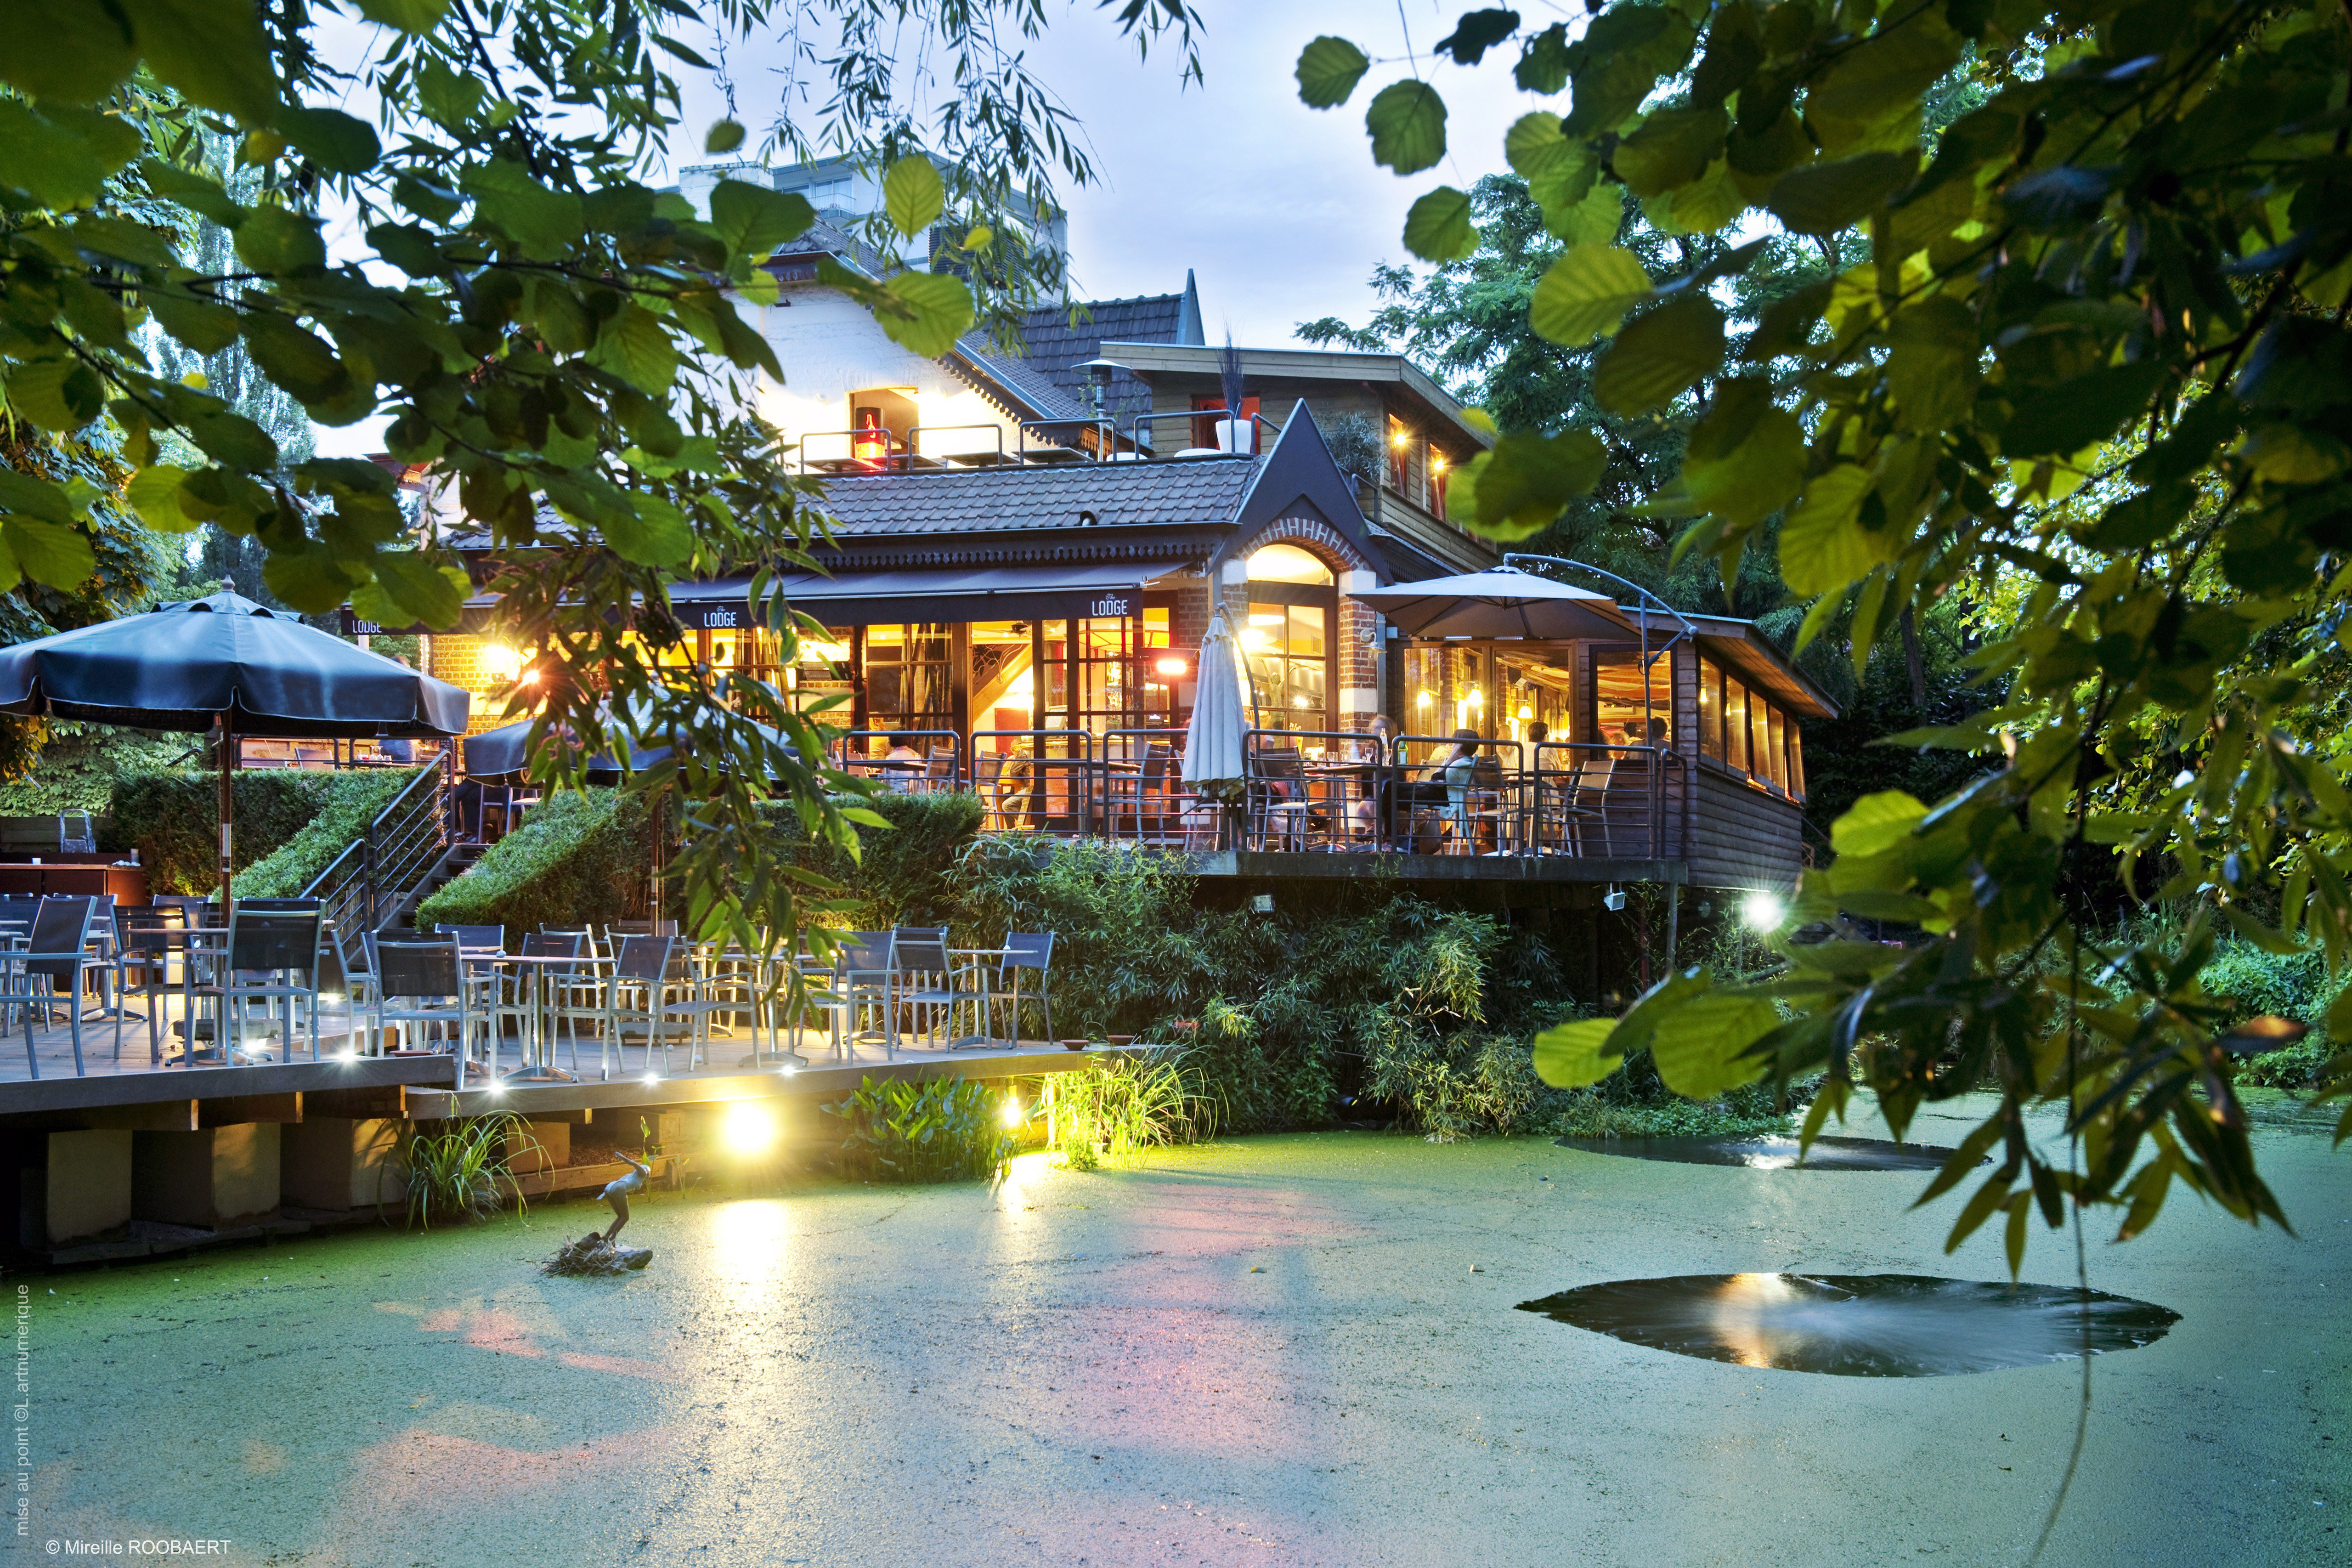 The lodge restaurant belge watermael boitsfort 1170 - Resto terrasse jardin bruxelles nanterre ...